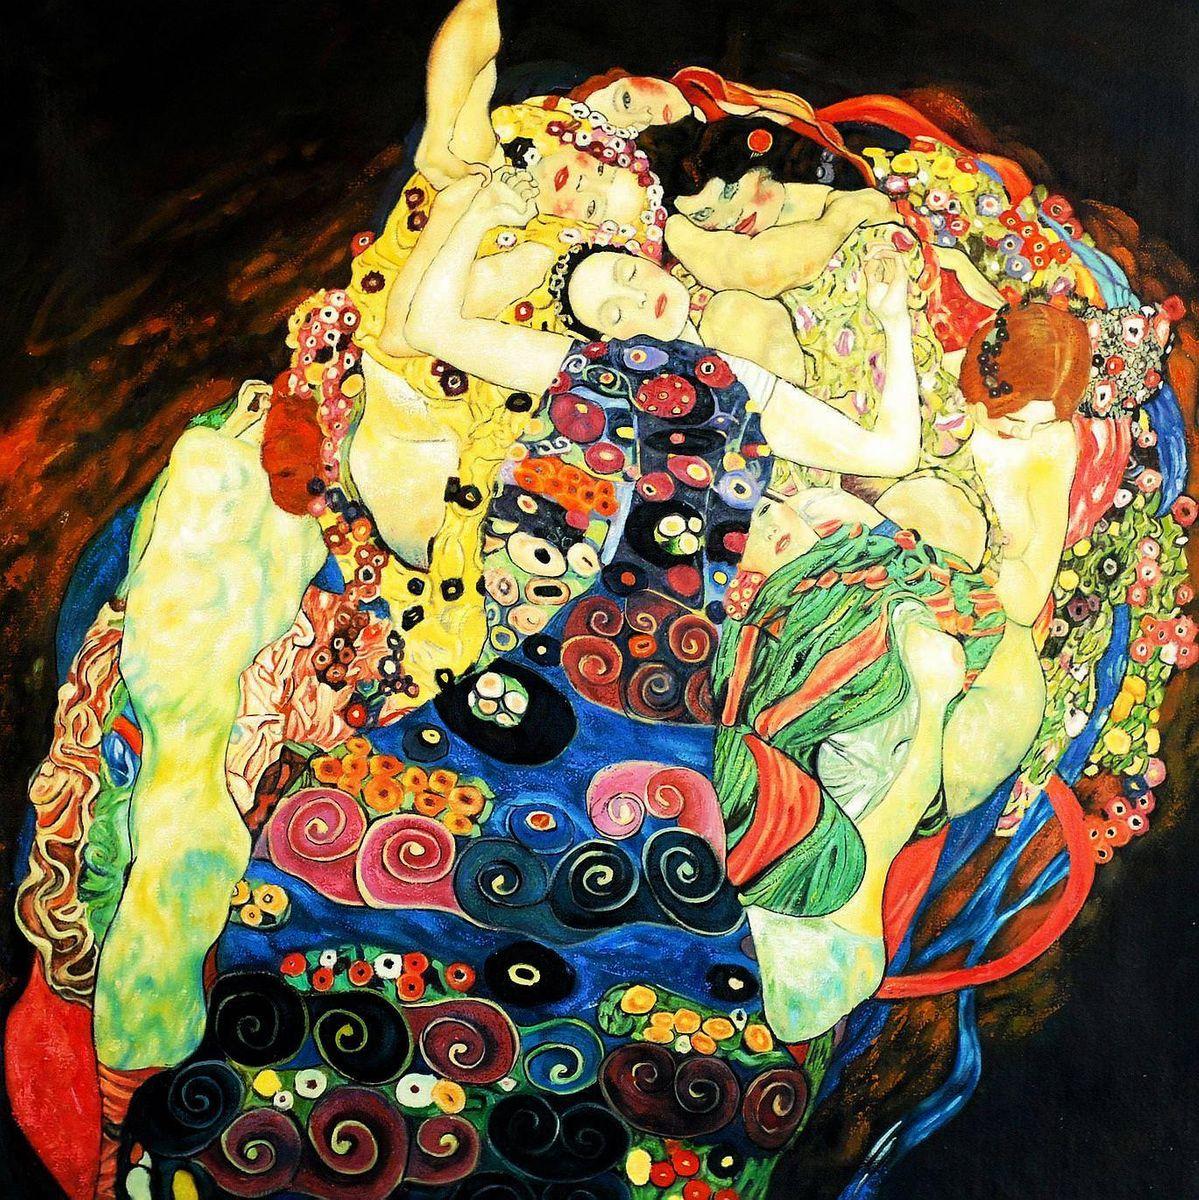 Gustav Klimt - Jungfrauen m93857 120x120cm Jugendstil Ölgemälde handgemalt